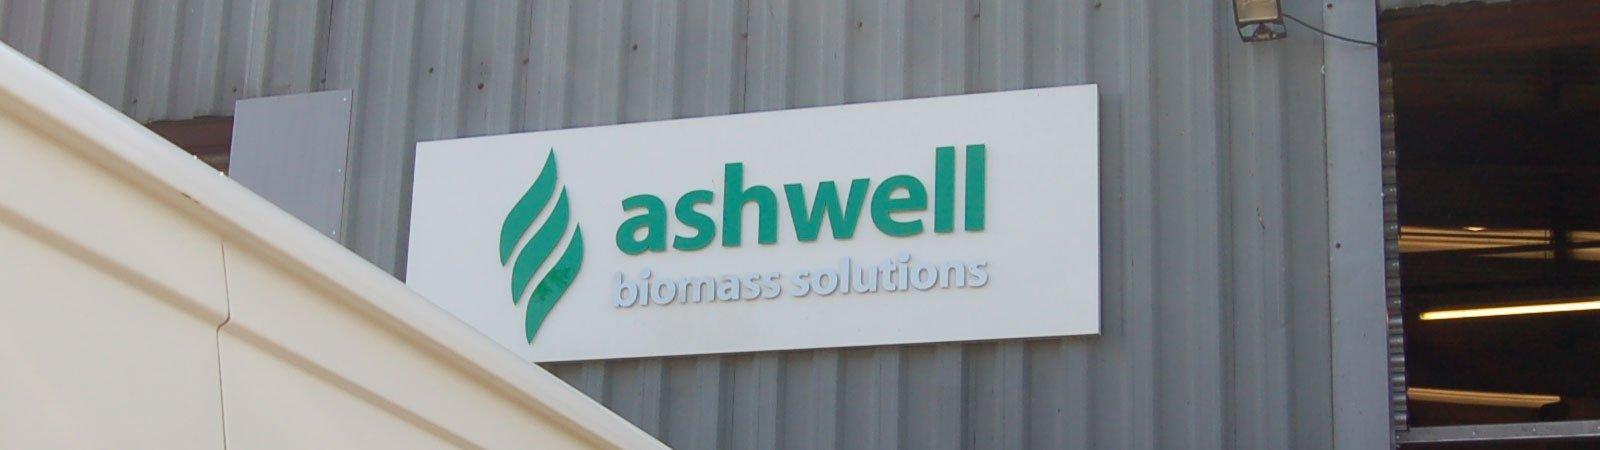 Ashwell advertisement board